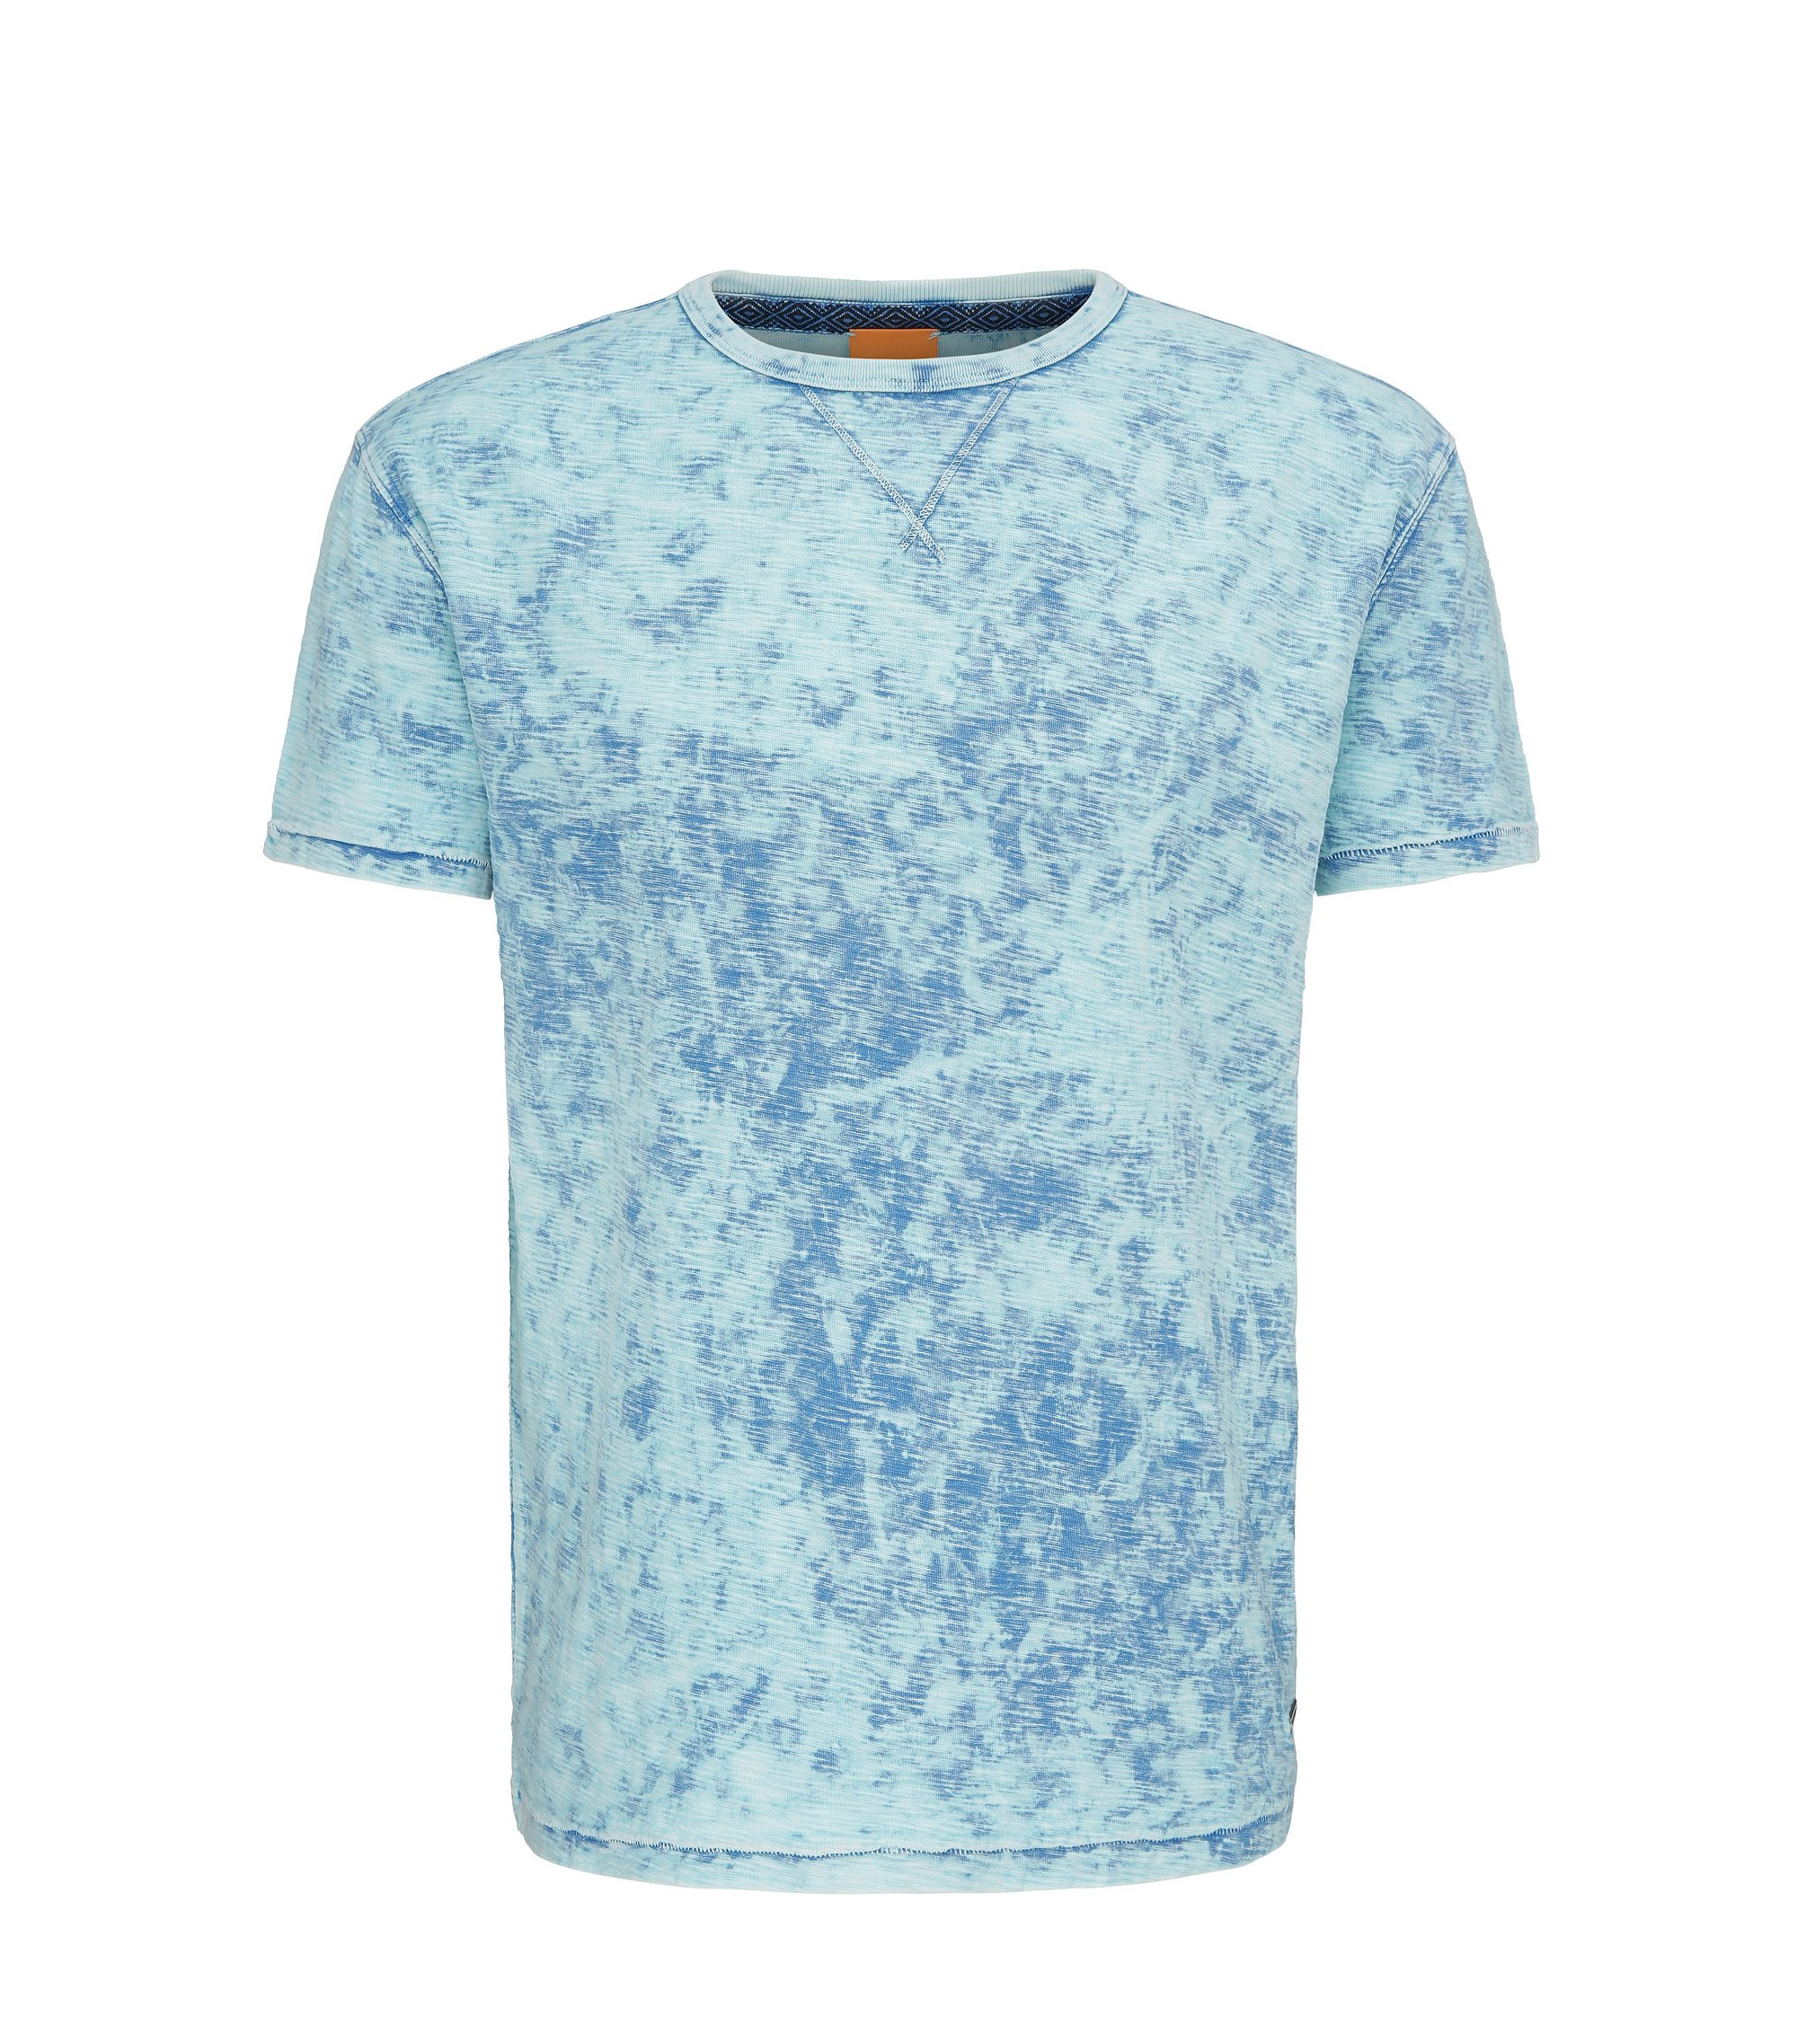 Heathered Cotton T-Shirt | Tay, Blue